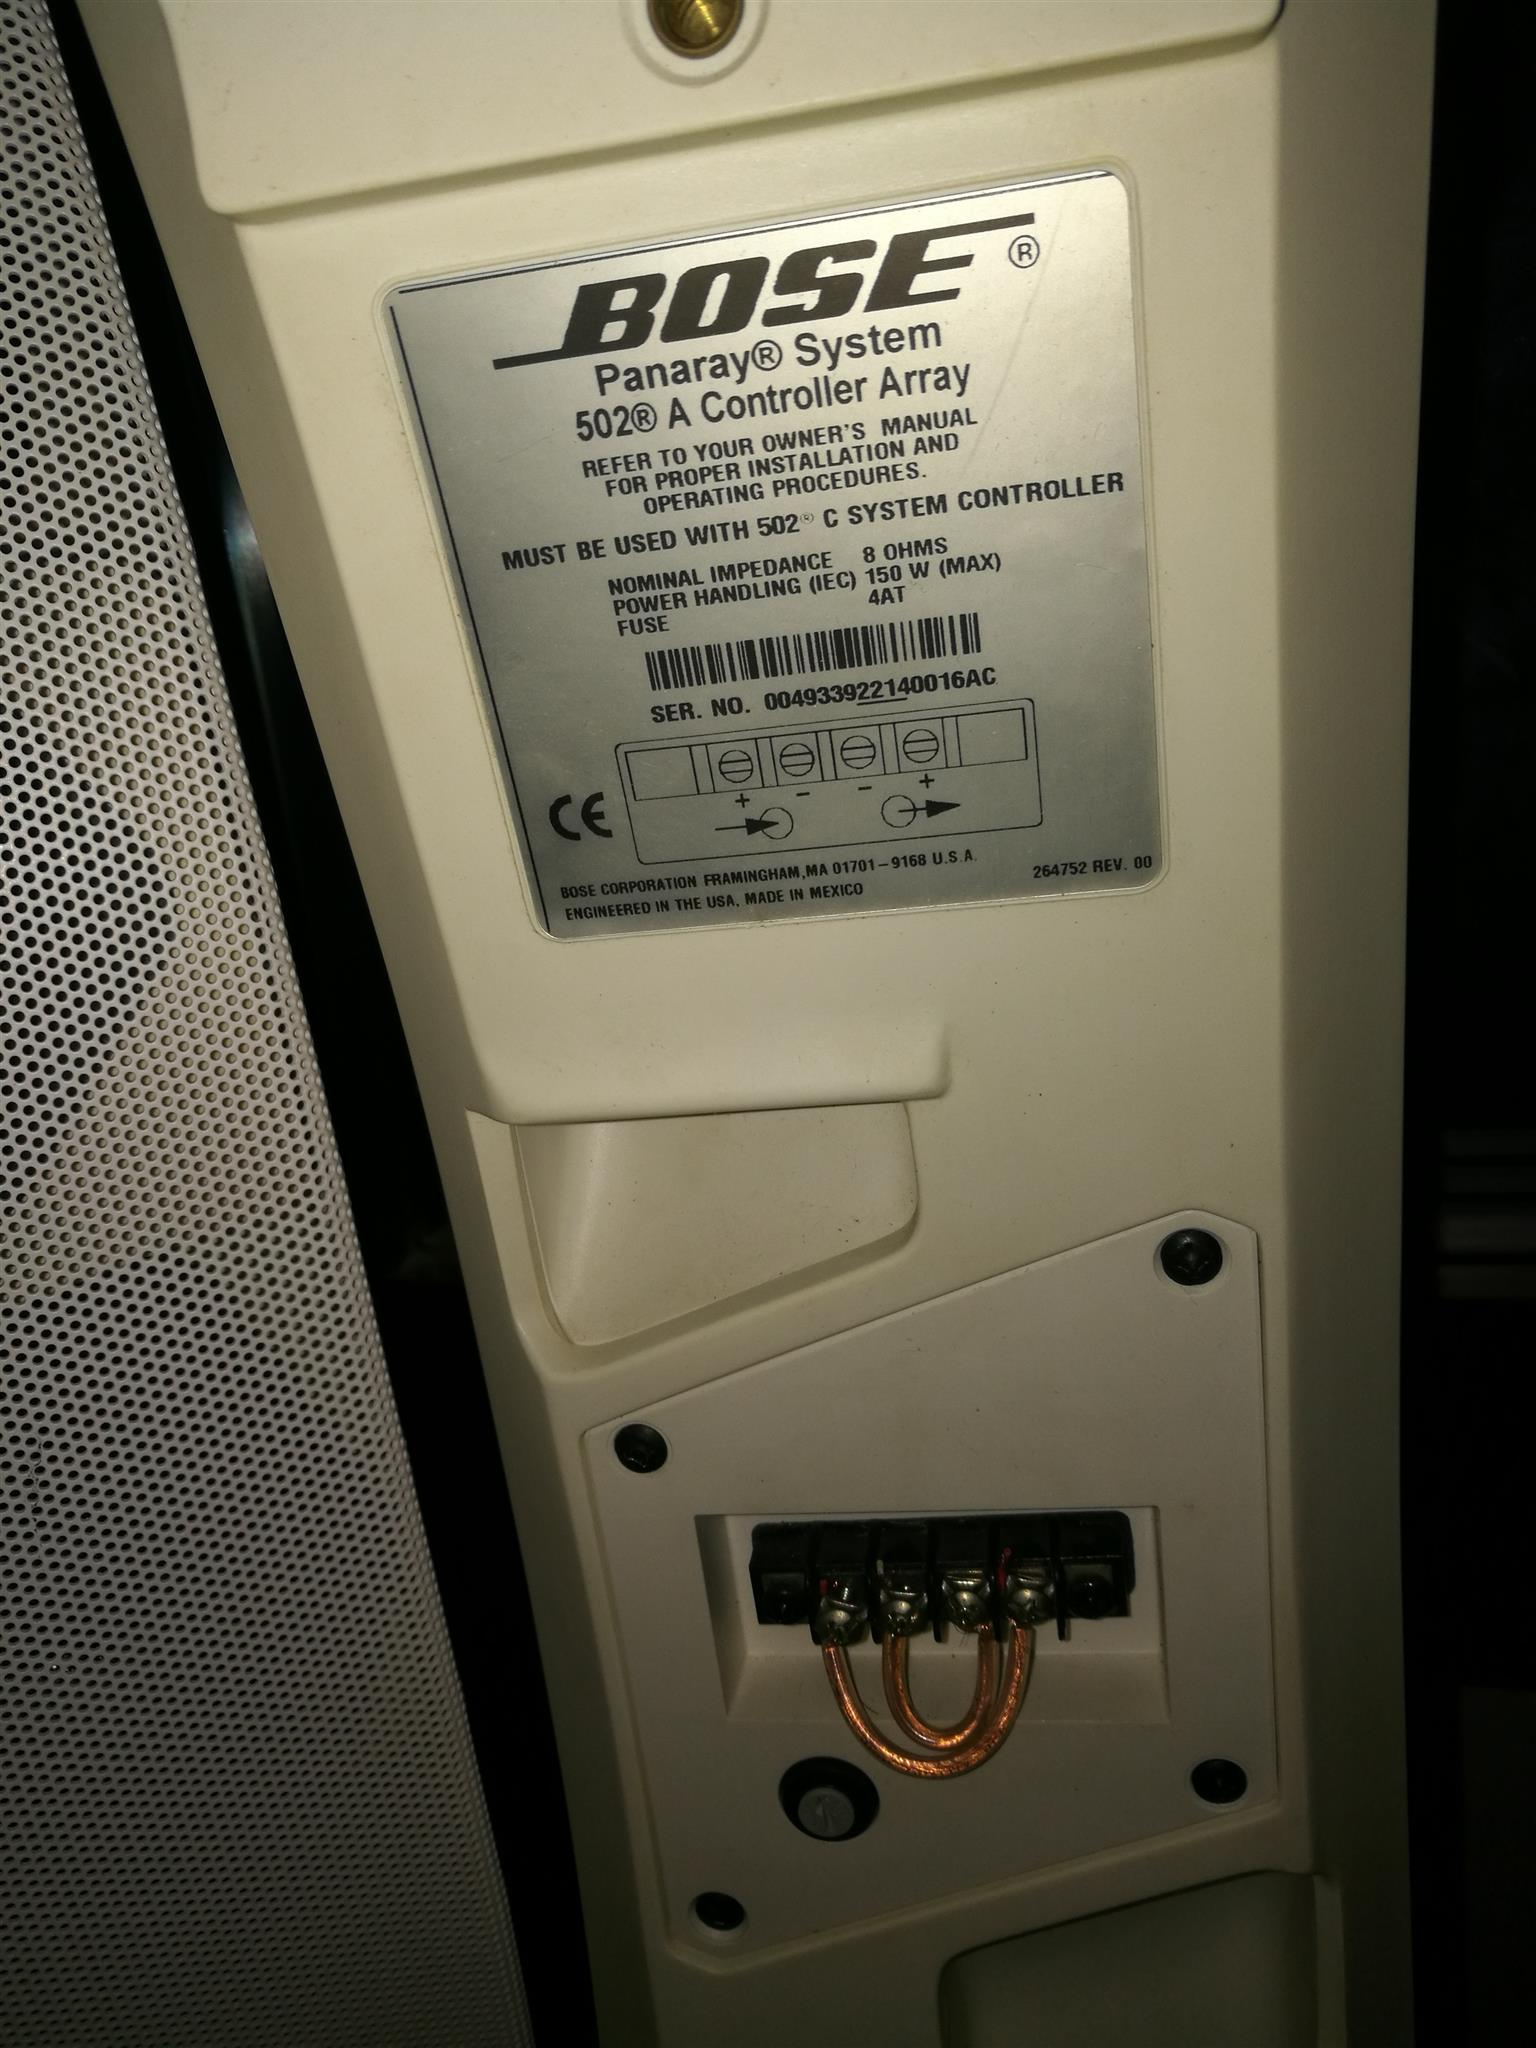 Bose Panaray 502A speakers x3